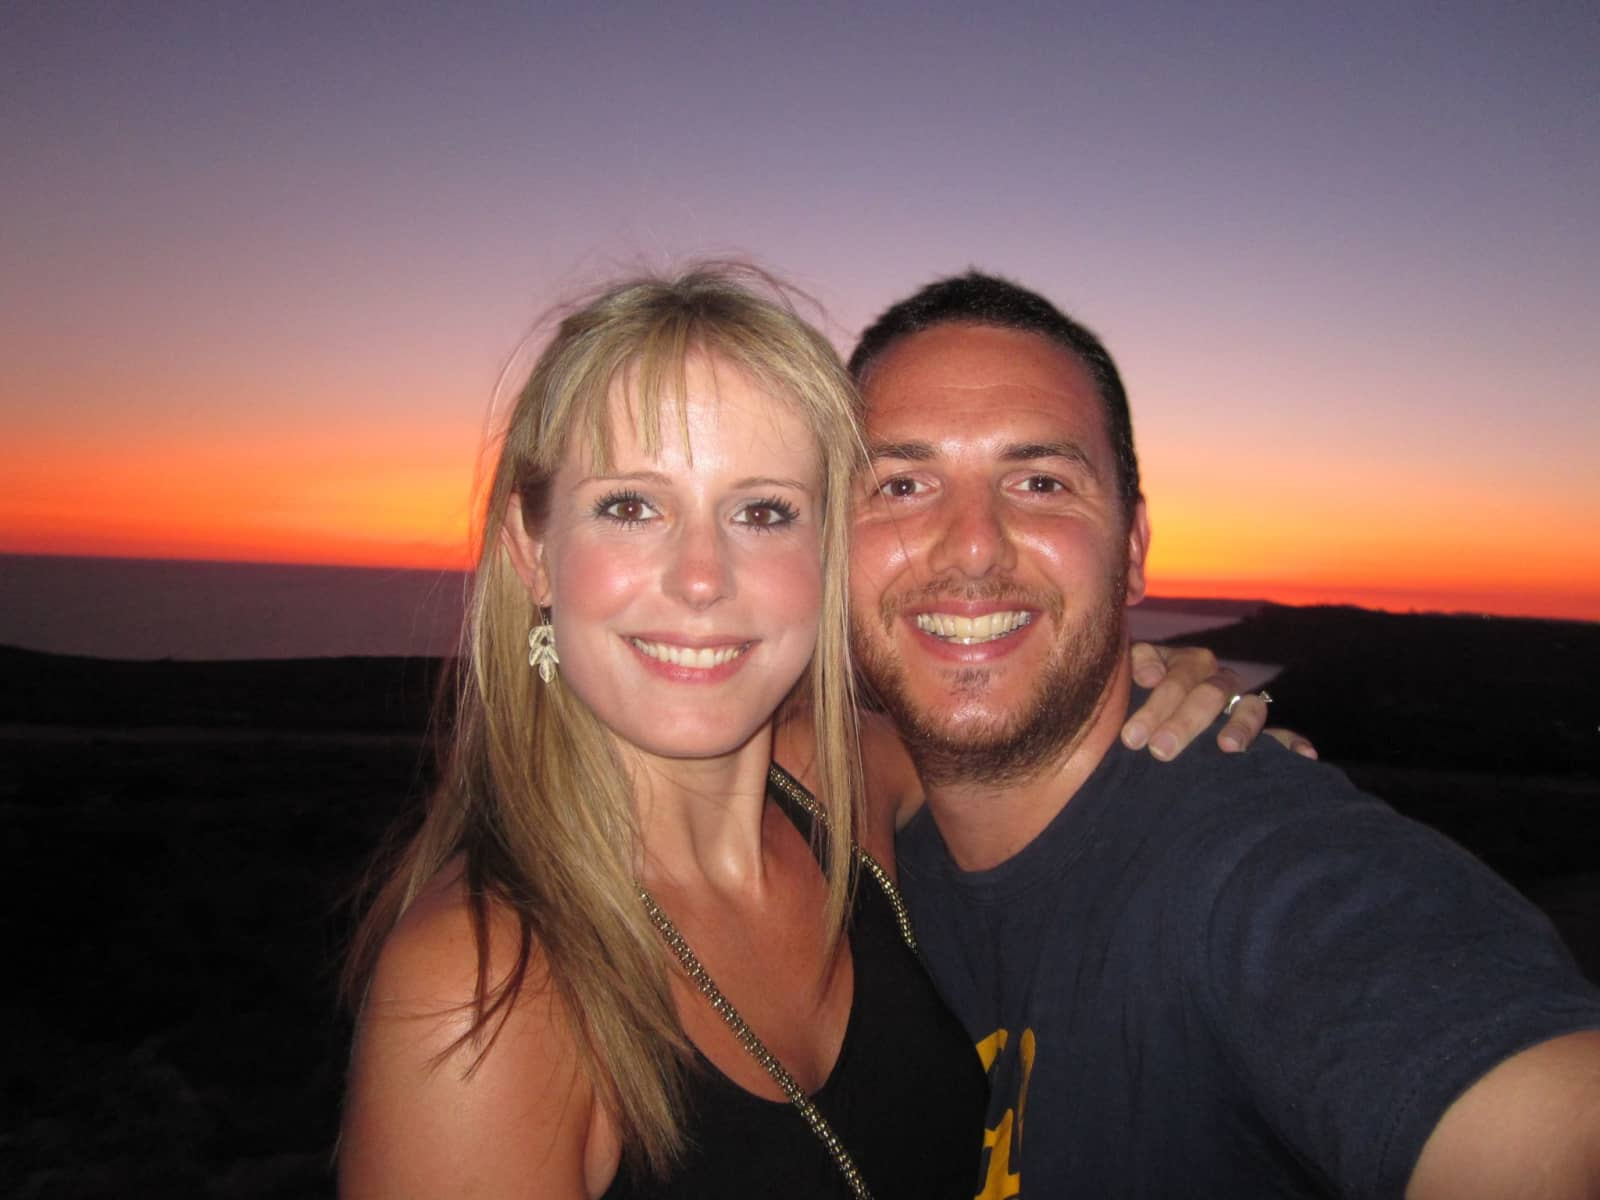 Daniel & Charlotte from London, United Kingdom